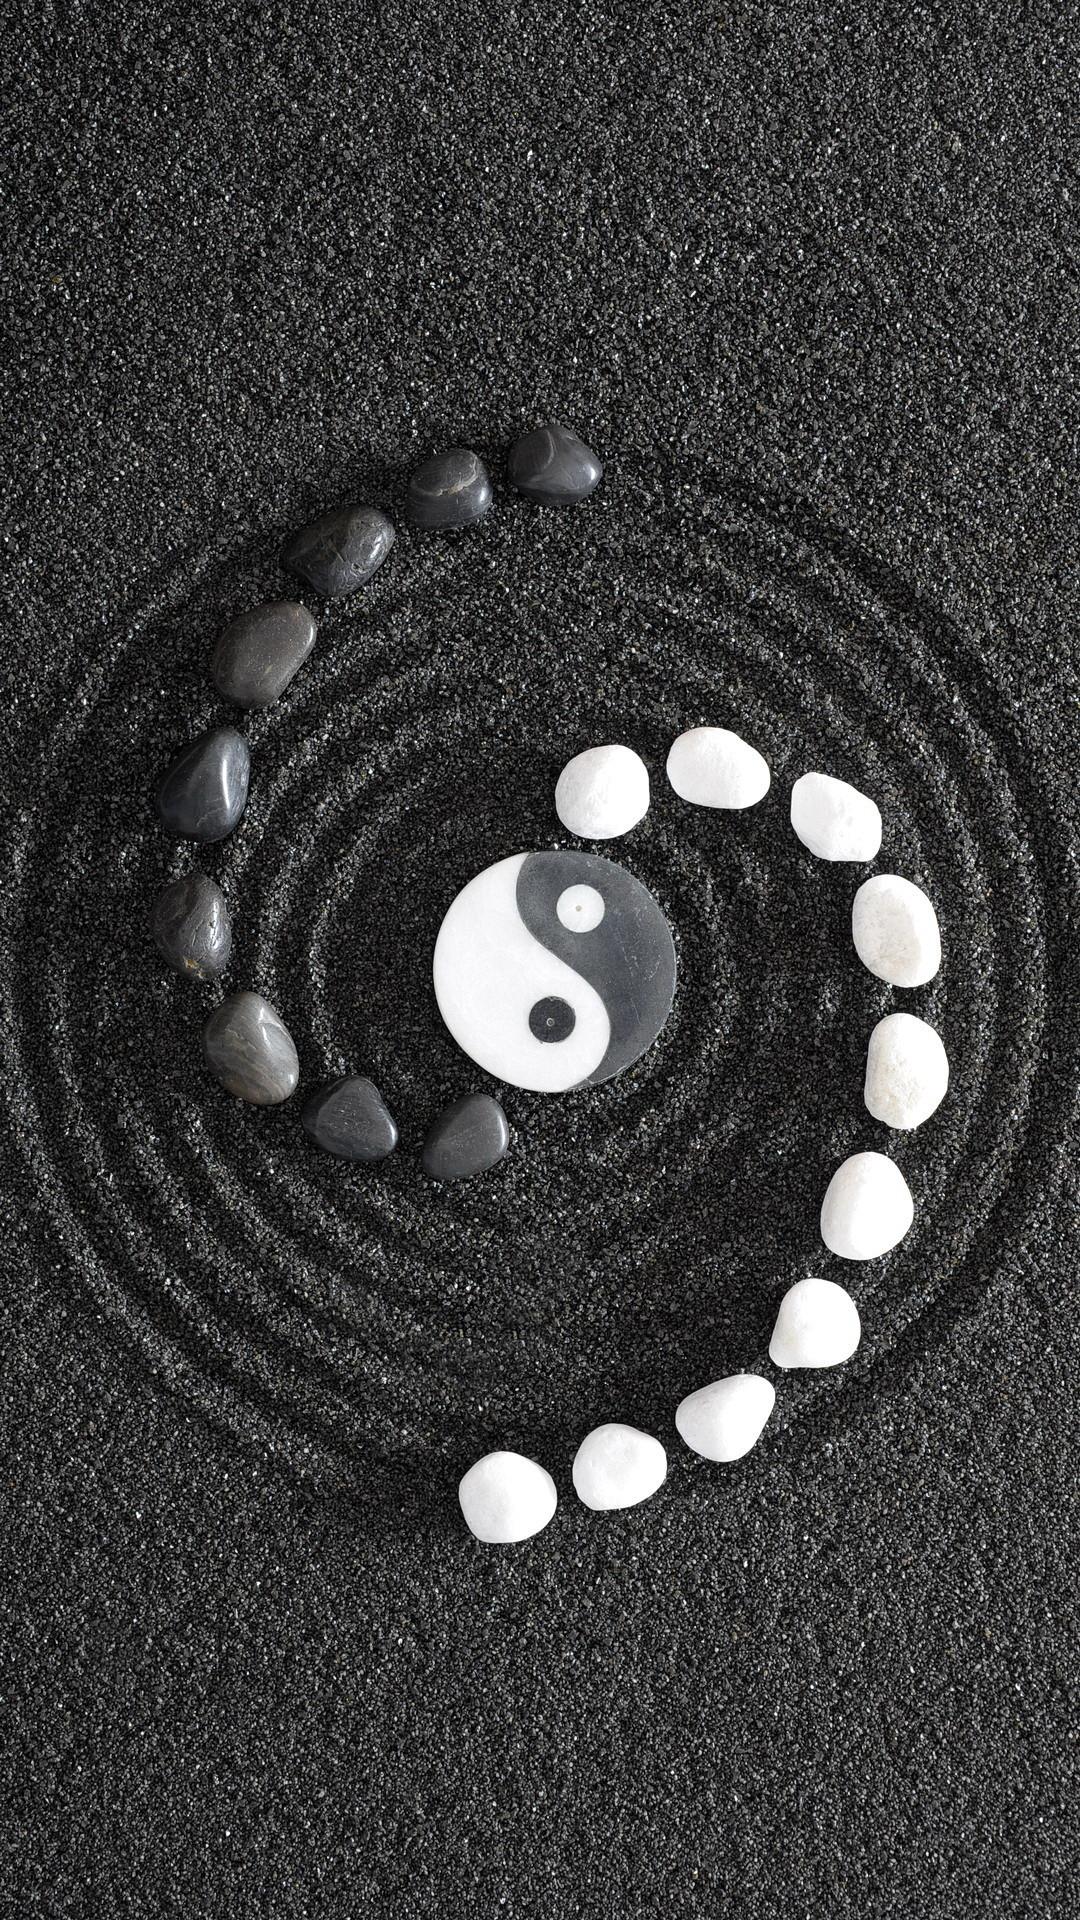 Cool yin yang wallpaper 61 images - Yin and yang wallpaper ...